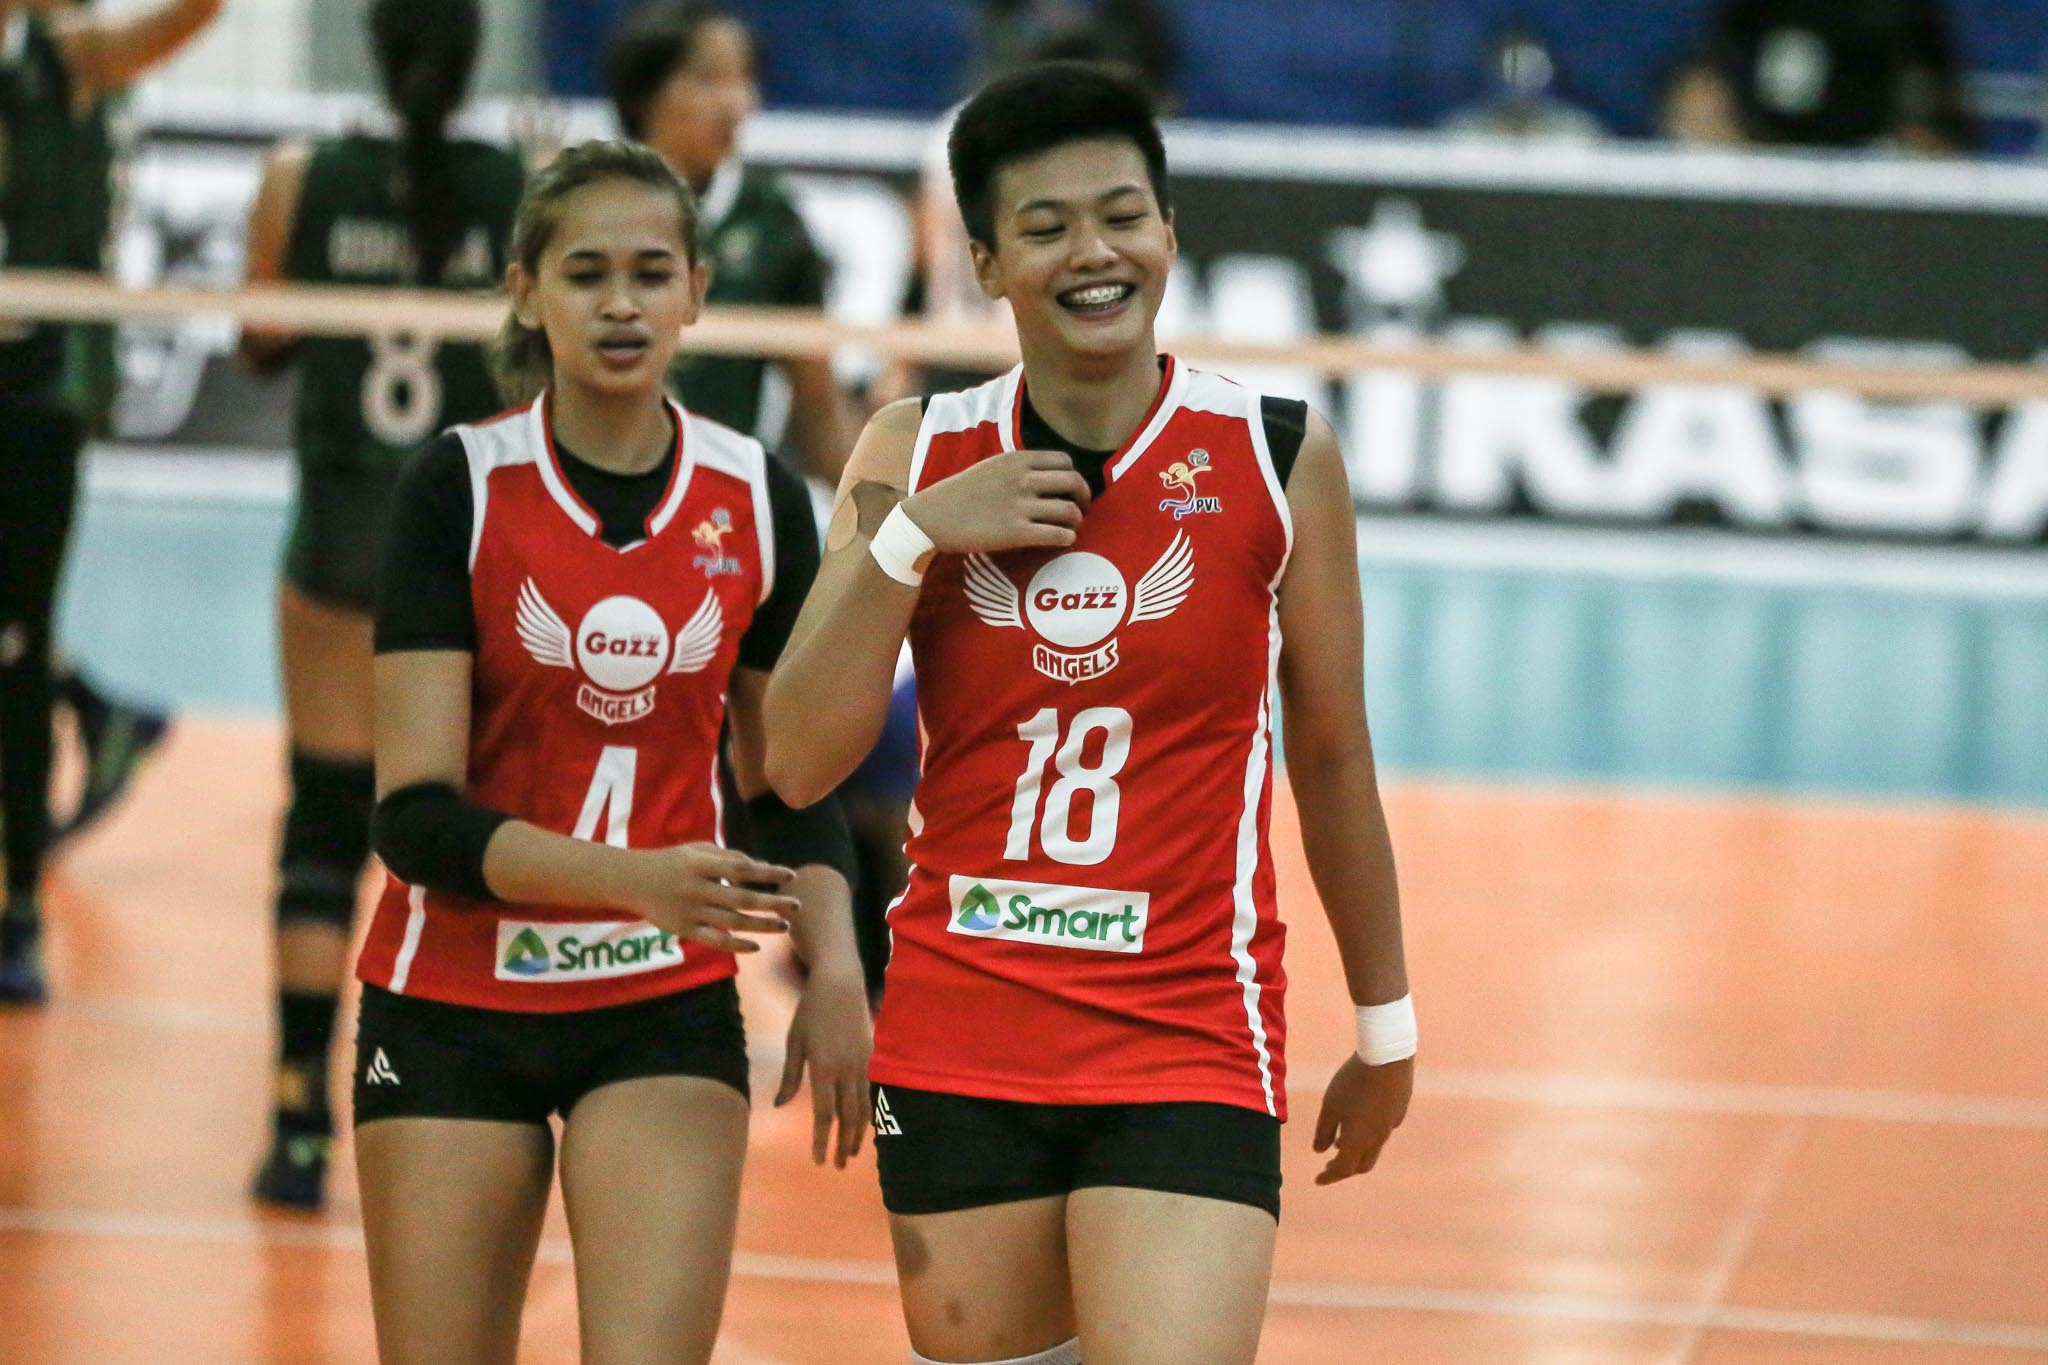 PVL-BUBBLE-2021-Petro-Gazz-vs-Army-Meneses-Petro-Gazz-2 Ria Meneses stayed composed amid delay: 'Ang tagal naming hinintay 'to' News PVL Volleyball  - philippine sports news